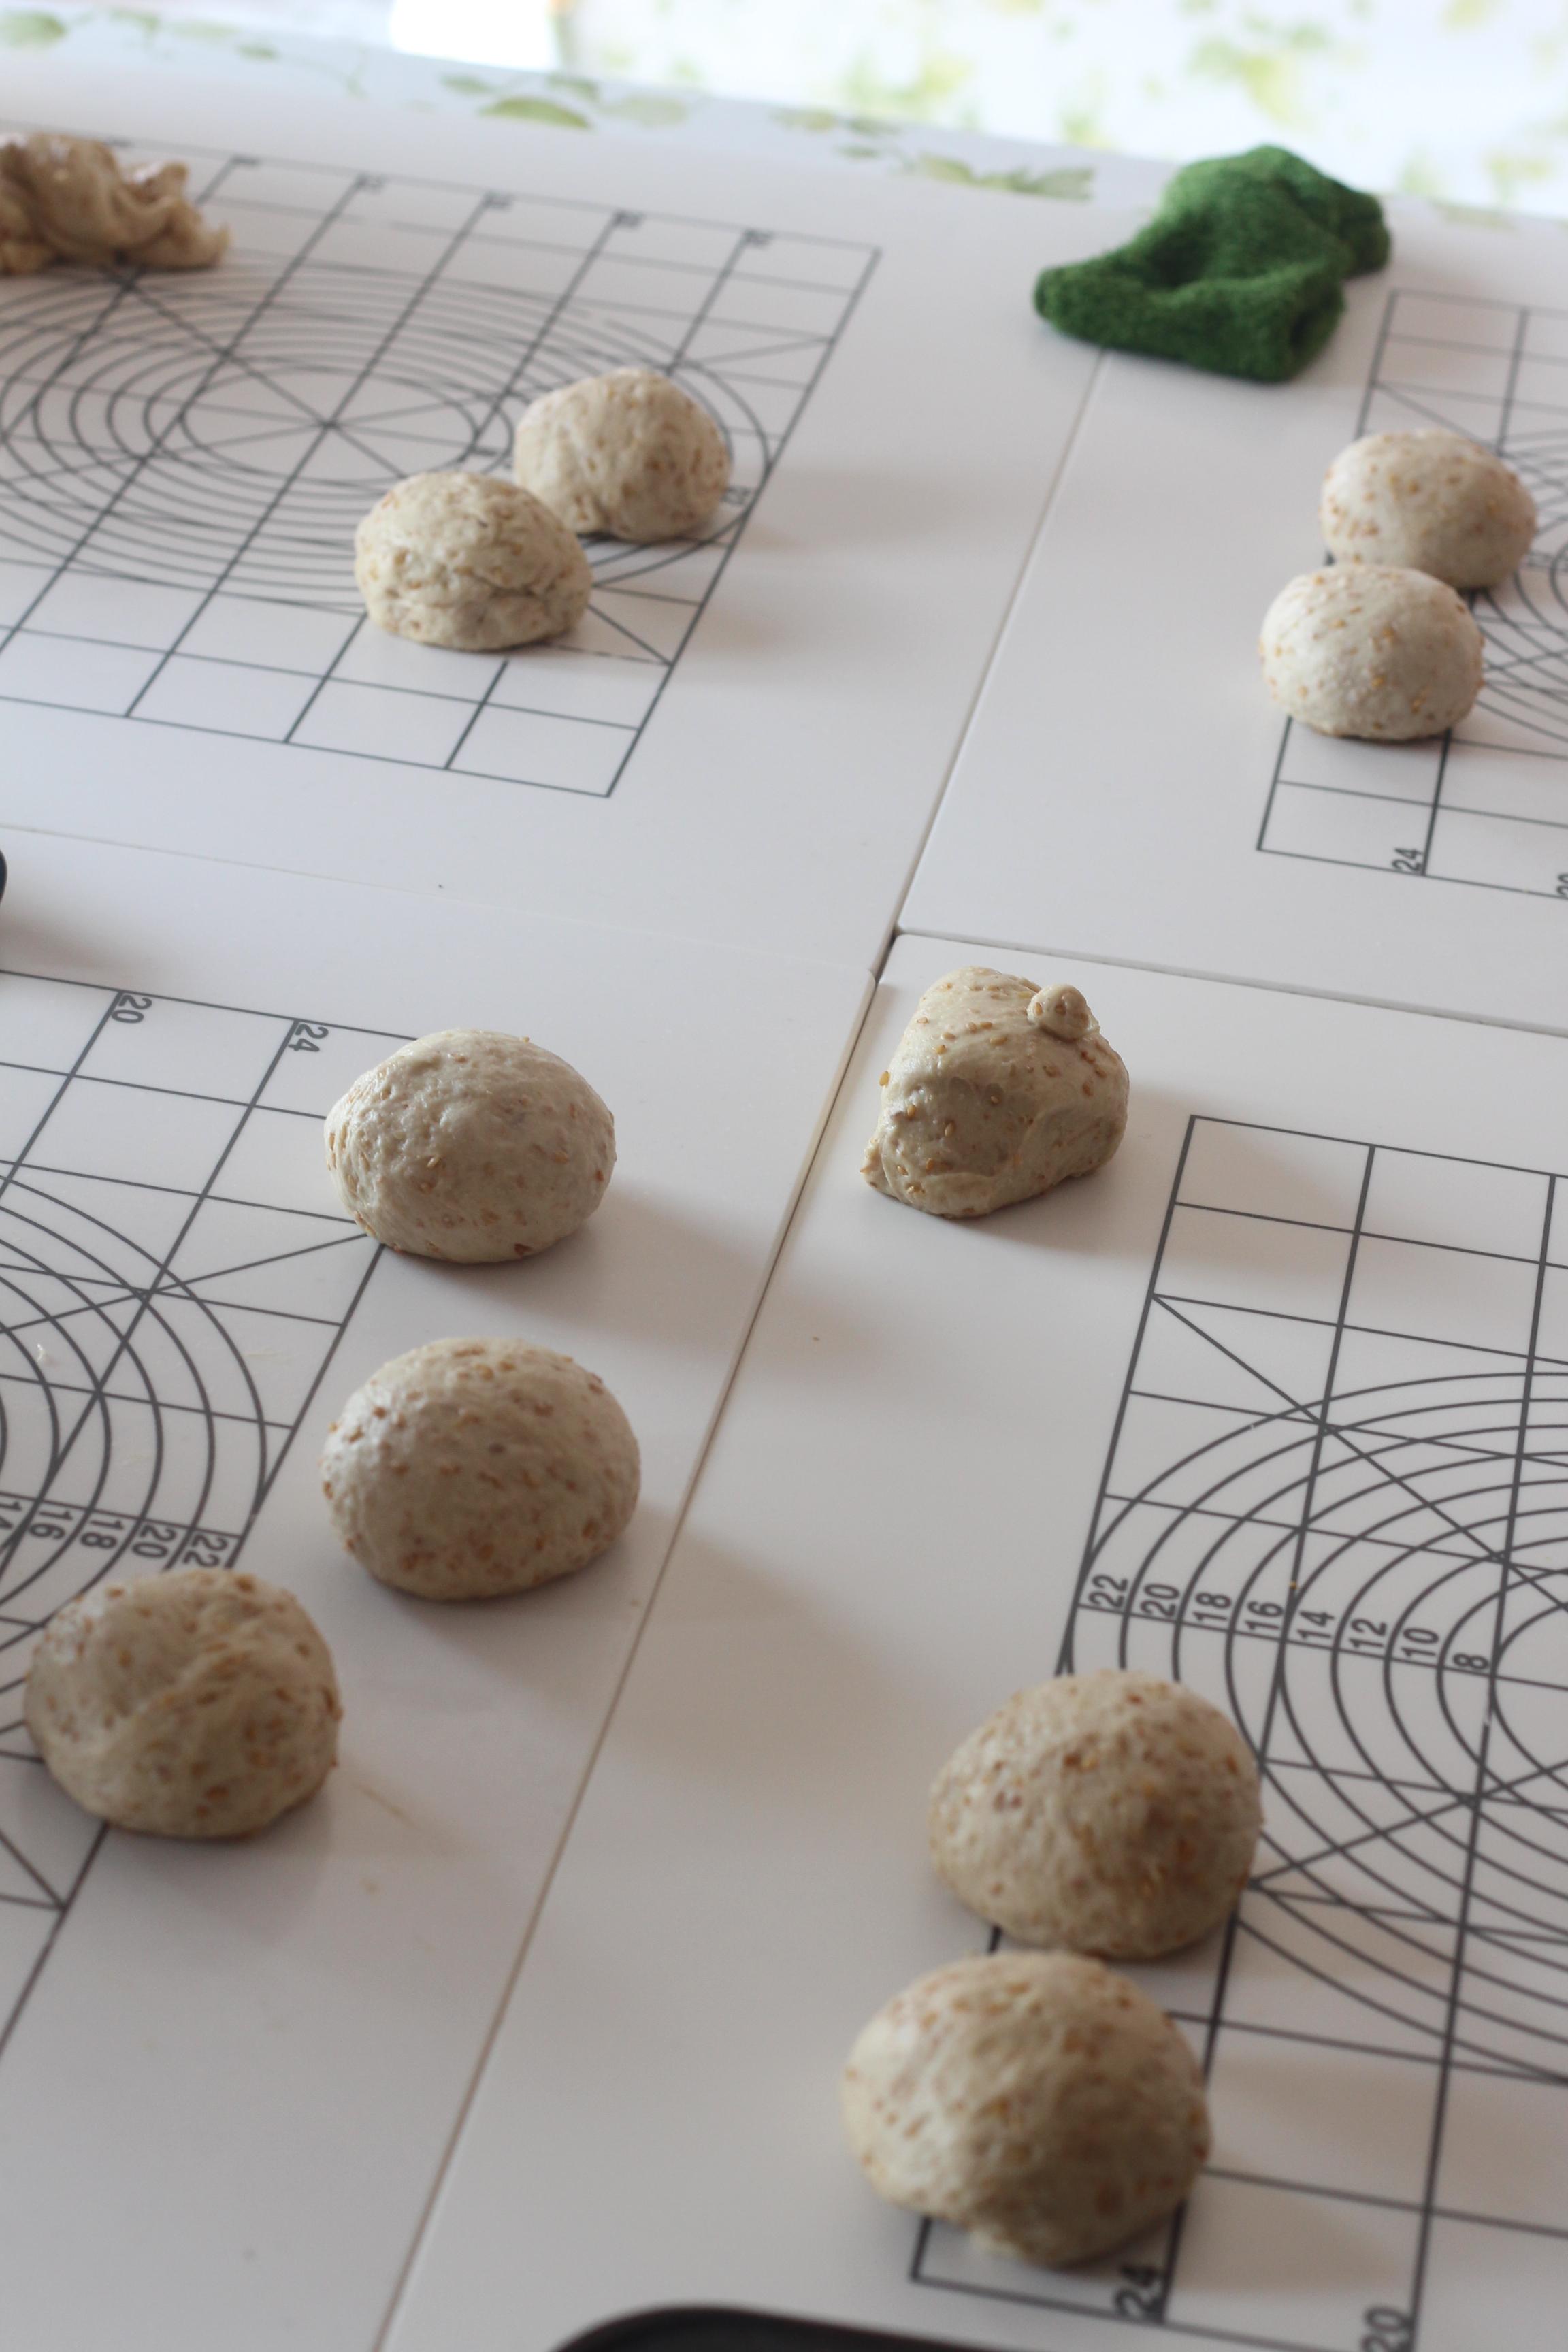 a-ta-sante糖質制限パン料理教室、京都江部粉糖質制限パンベーシックコース最終回『山食&ごまパン』